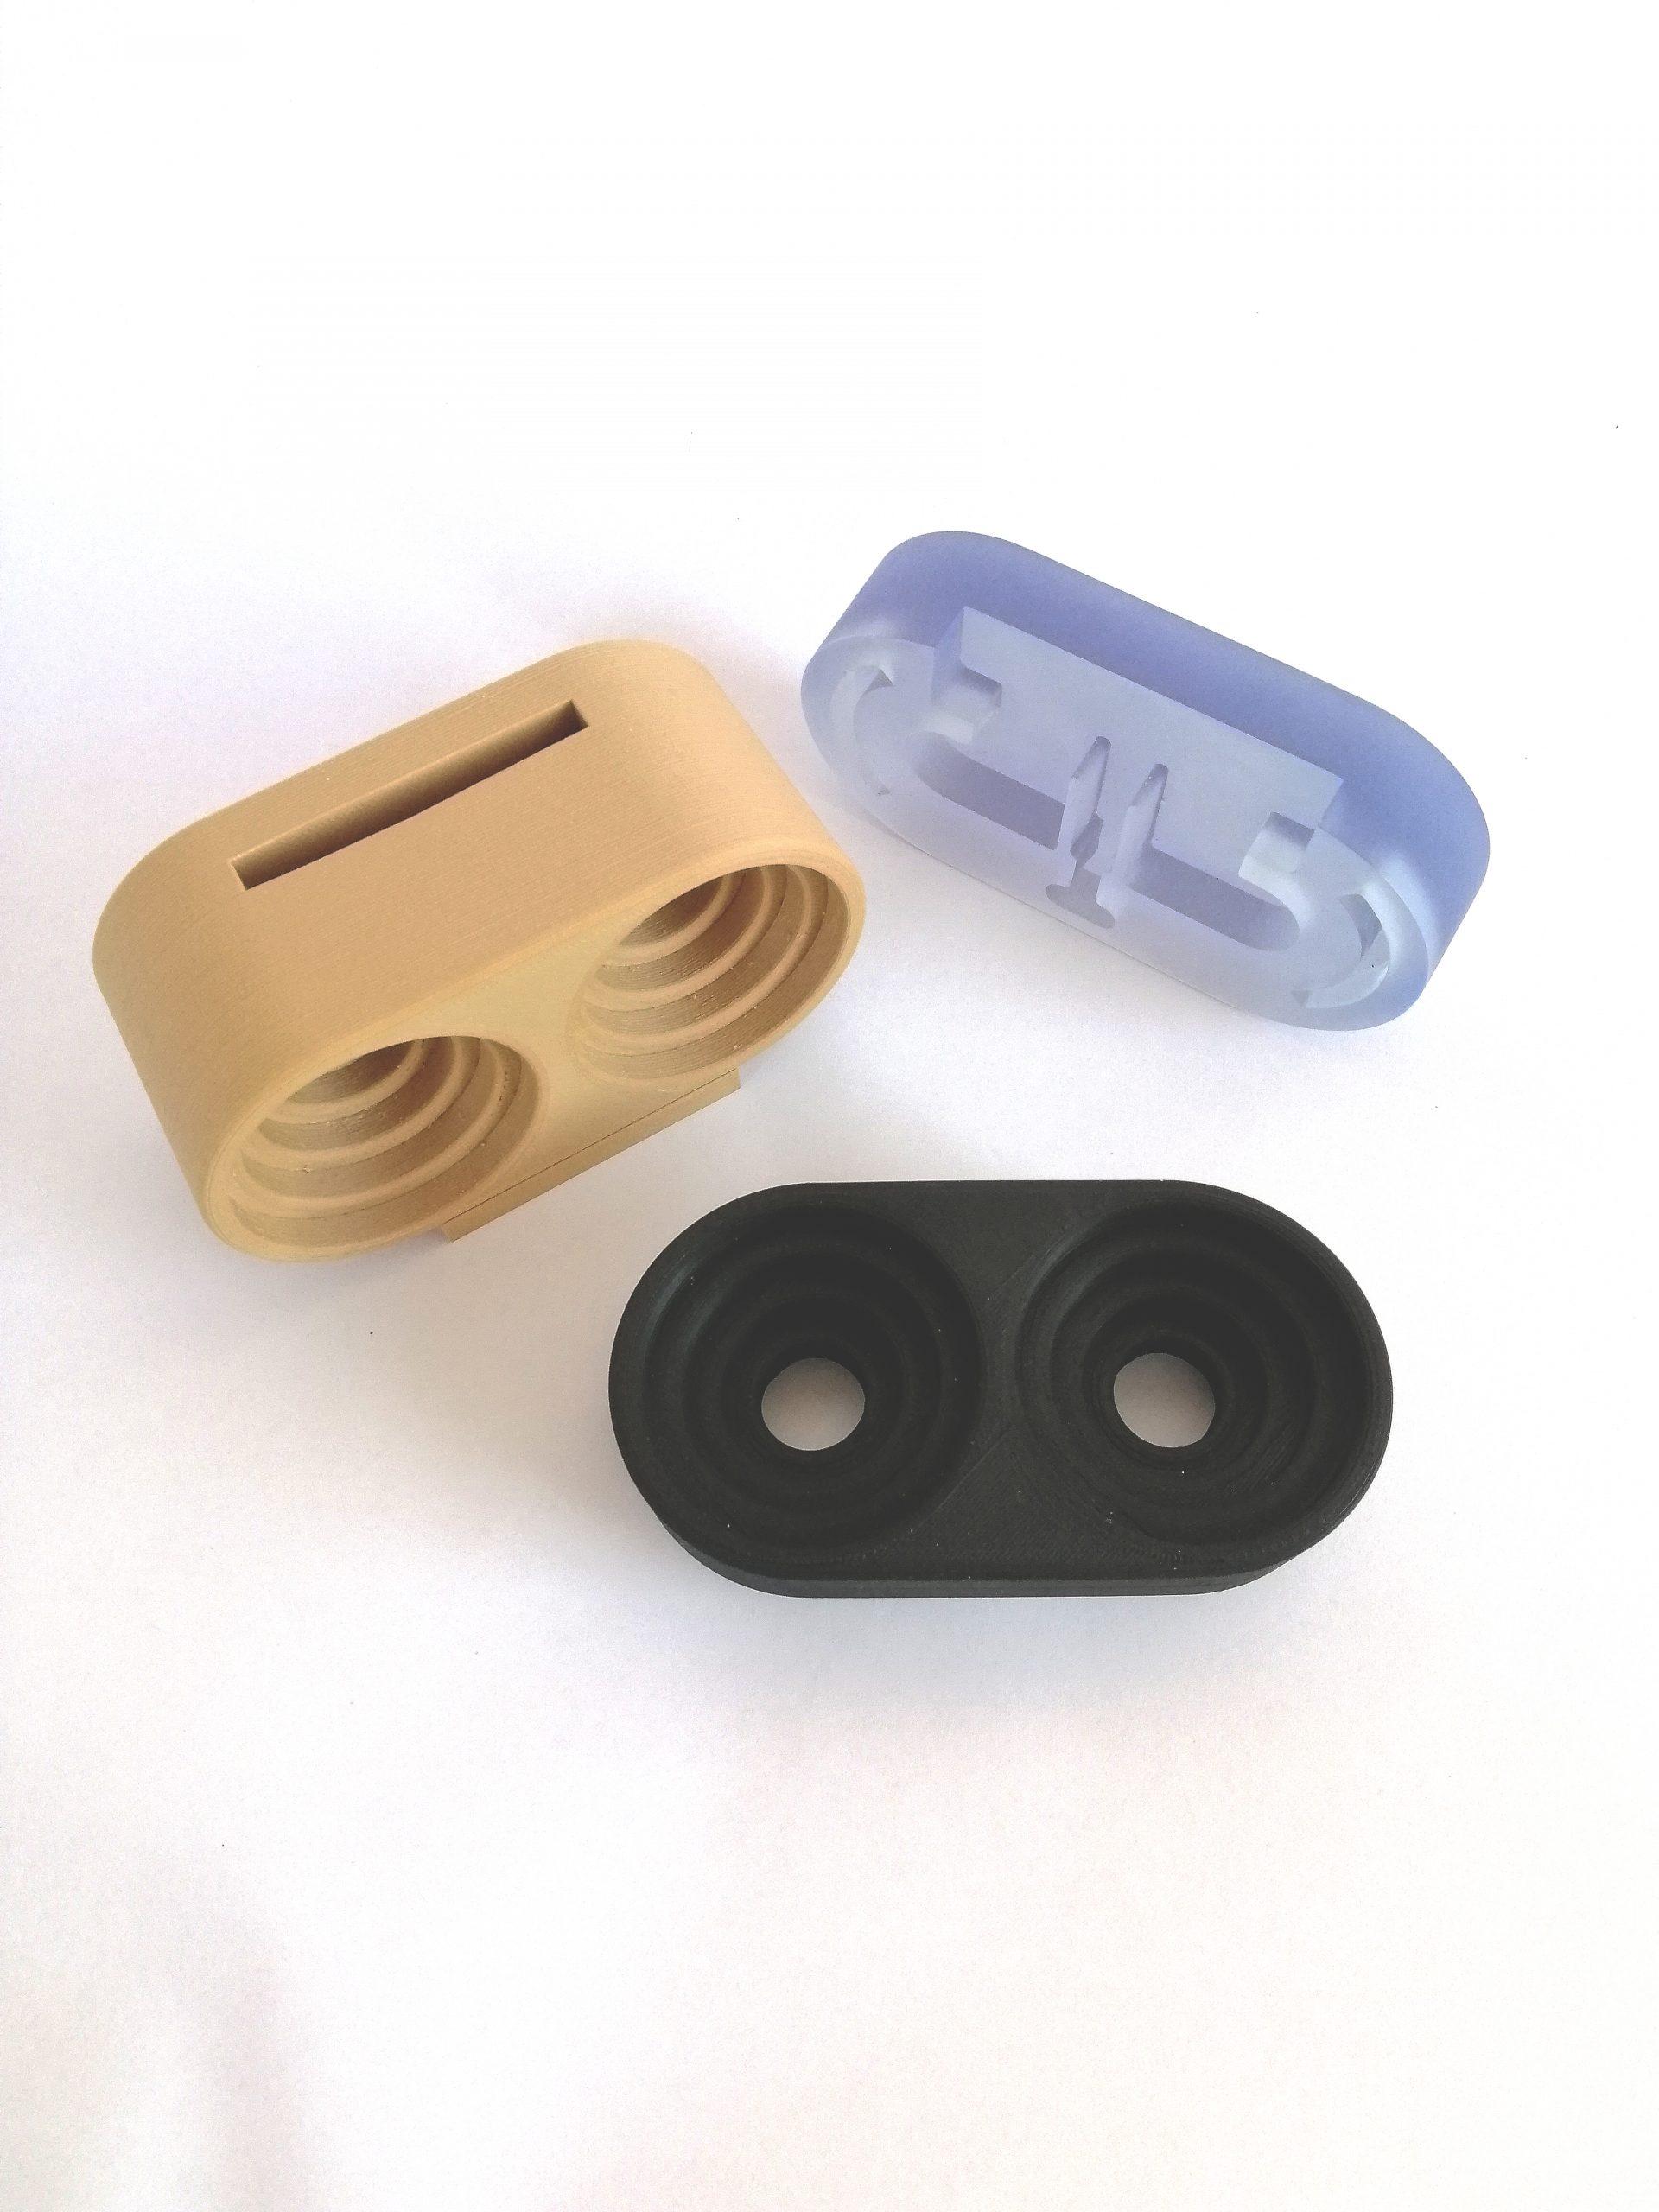 Cassa Acustica Stampa 3D PLA Resina - KreaItaly, Stampa 3d - Stampanti 3d Marche - Stampanti 3D prezzi - Aziende stampa 3d